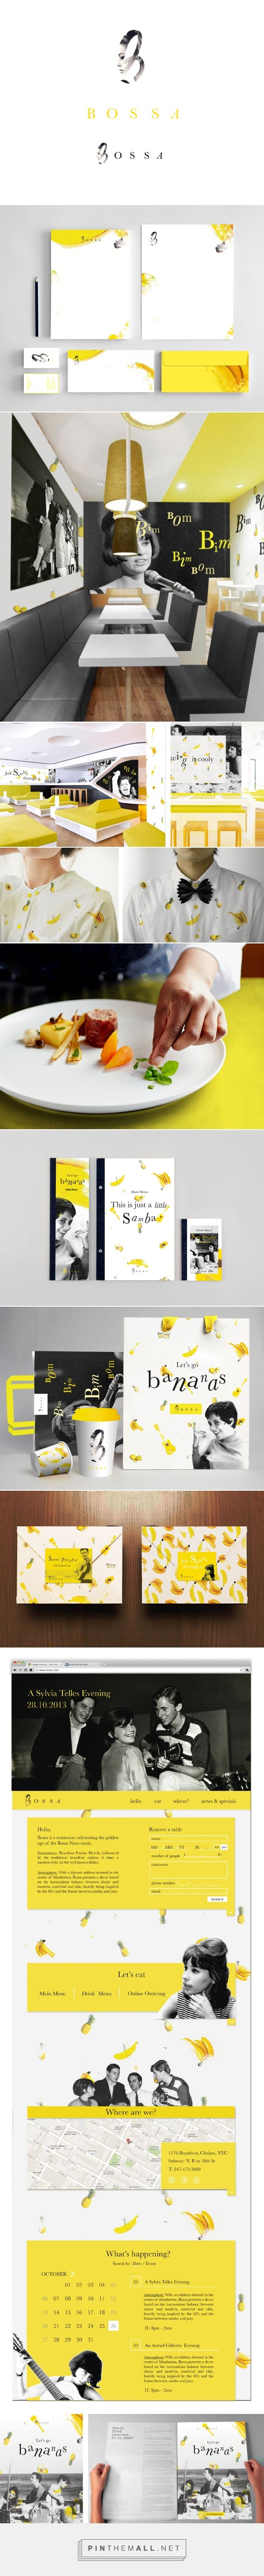 Bossa on Behance curated by Packaging Diva PD. Let's go bananas for the Bossa Nova packaging created via https://www.behance.net/gallery/Bossa/11202639